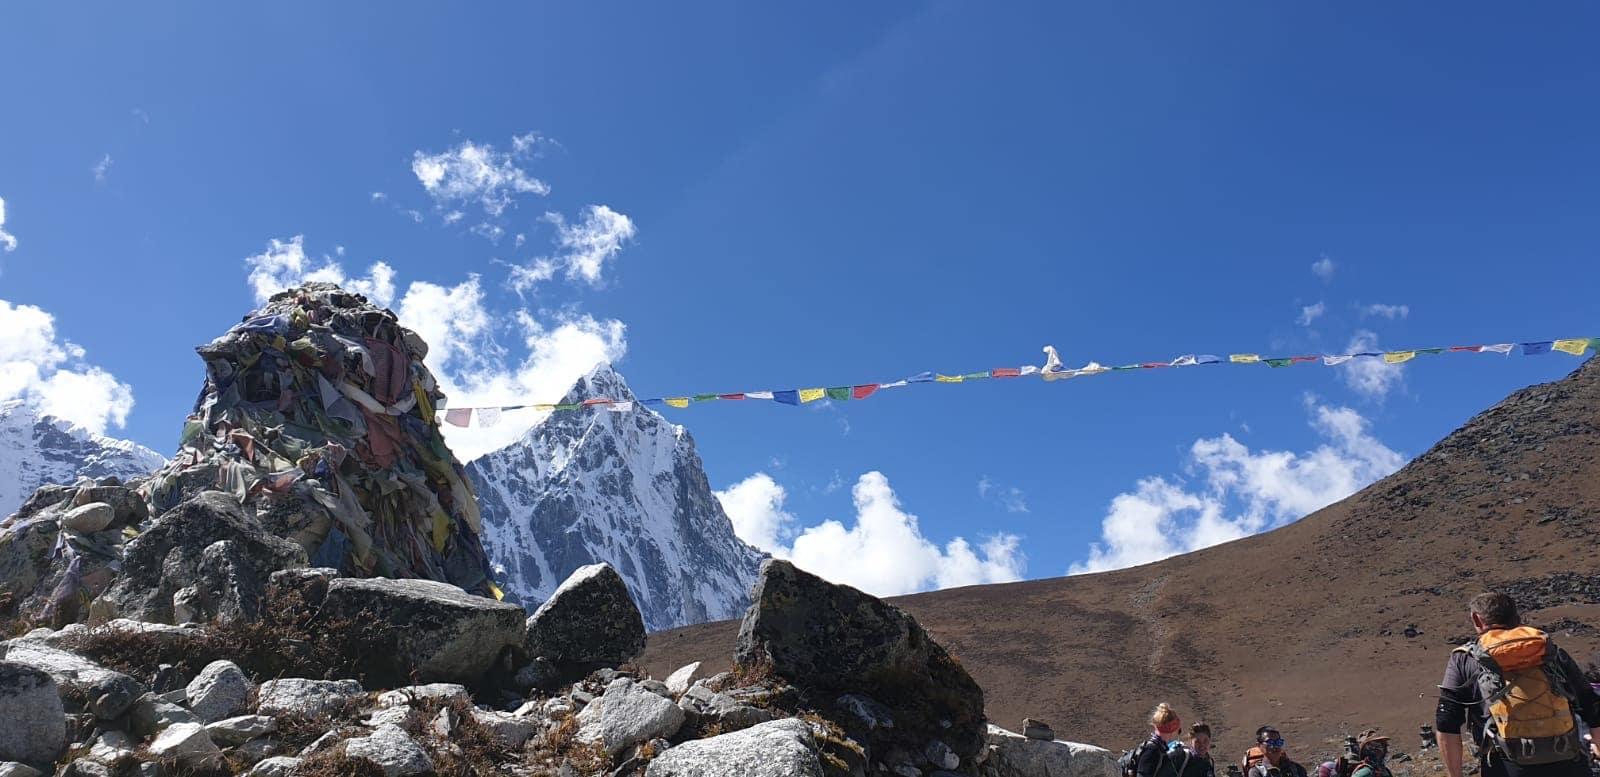 trekking to Everest Base Camp, Nepal